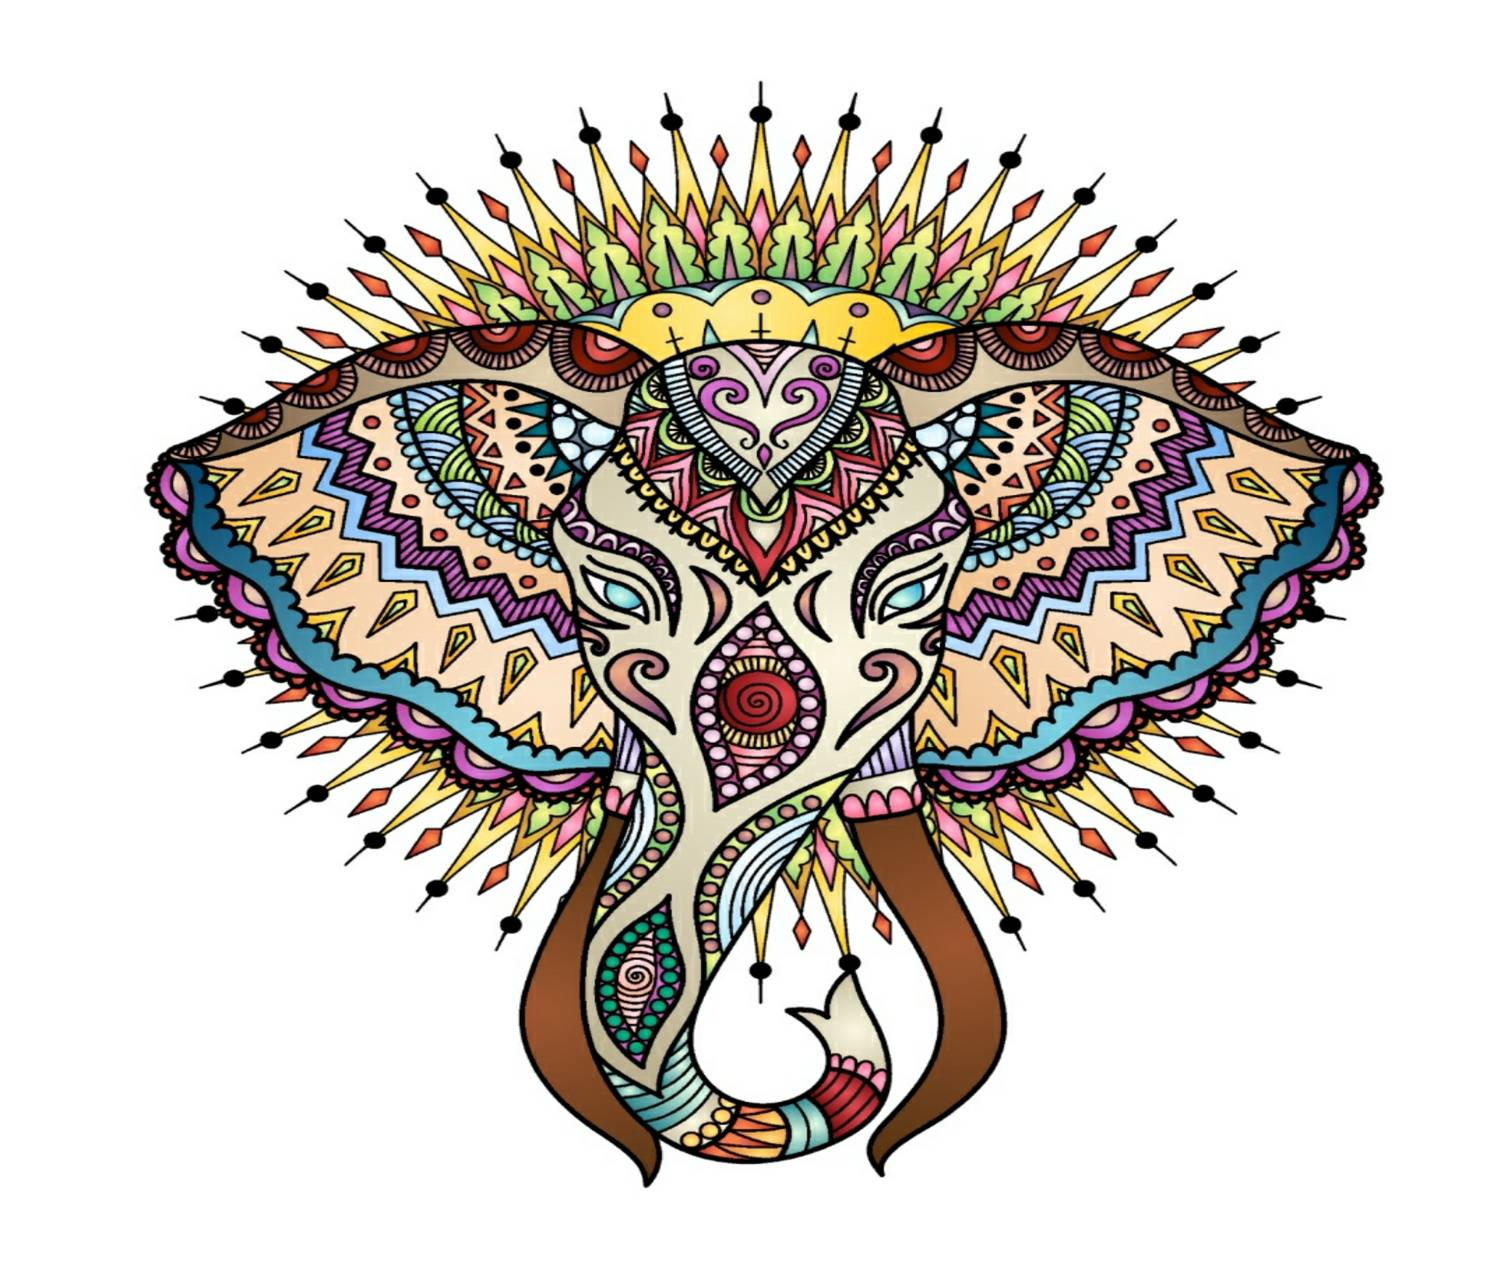 Celestial Elephant